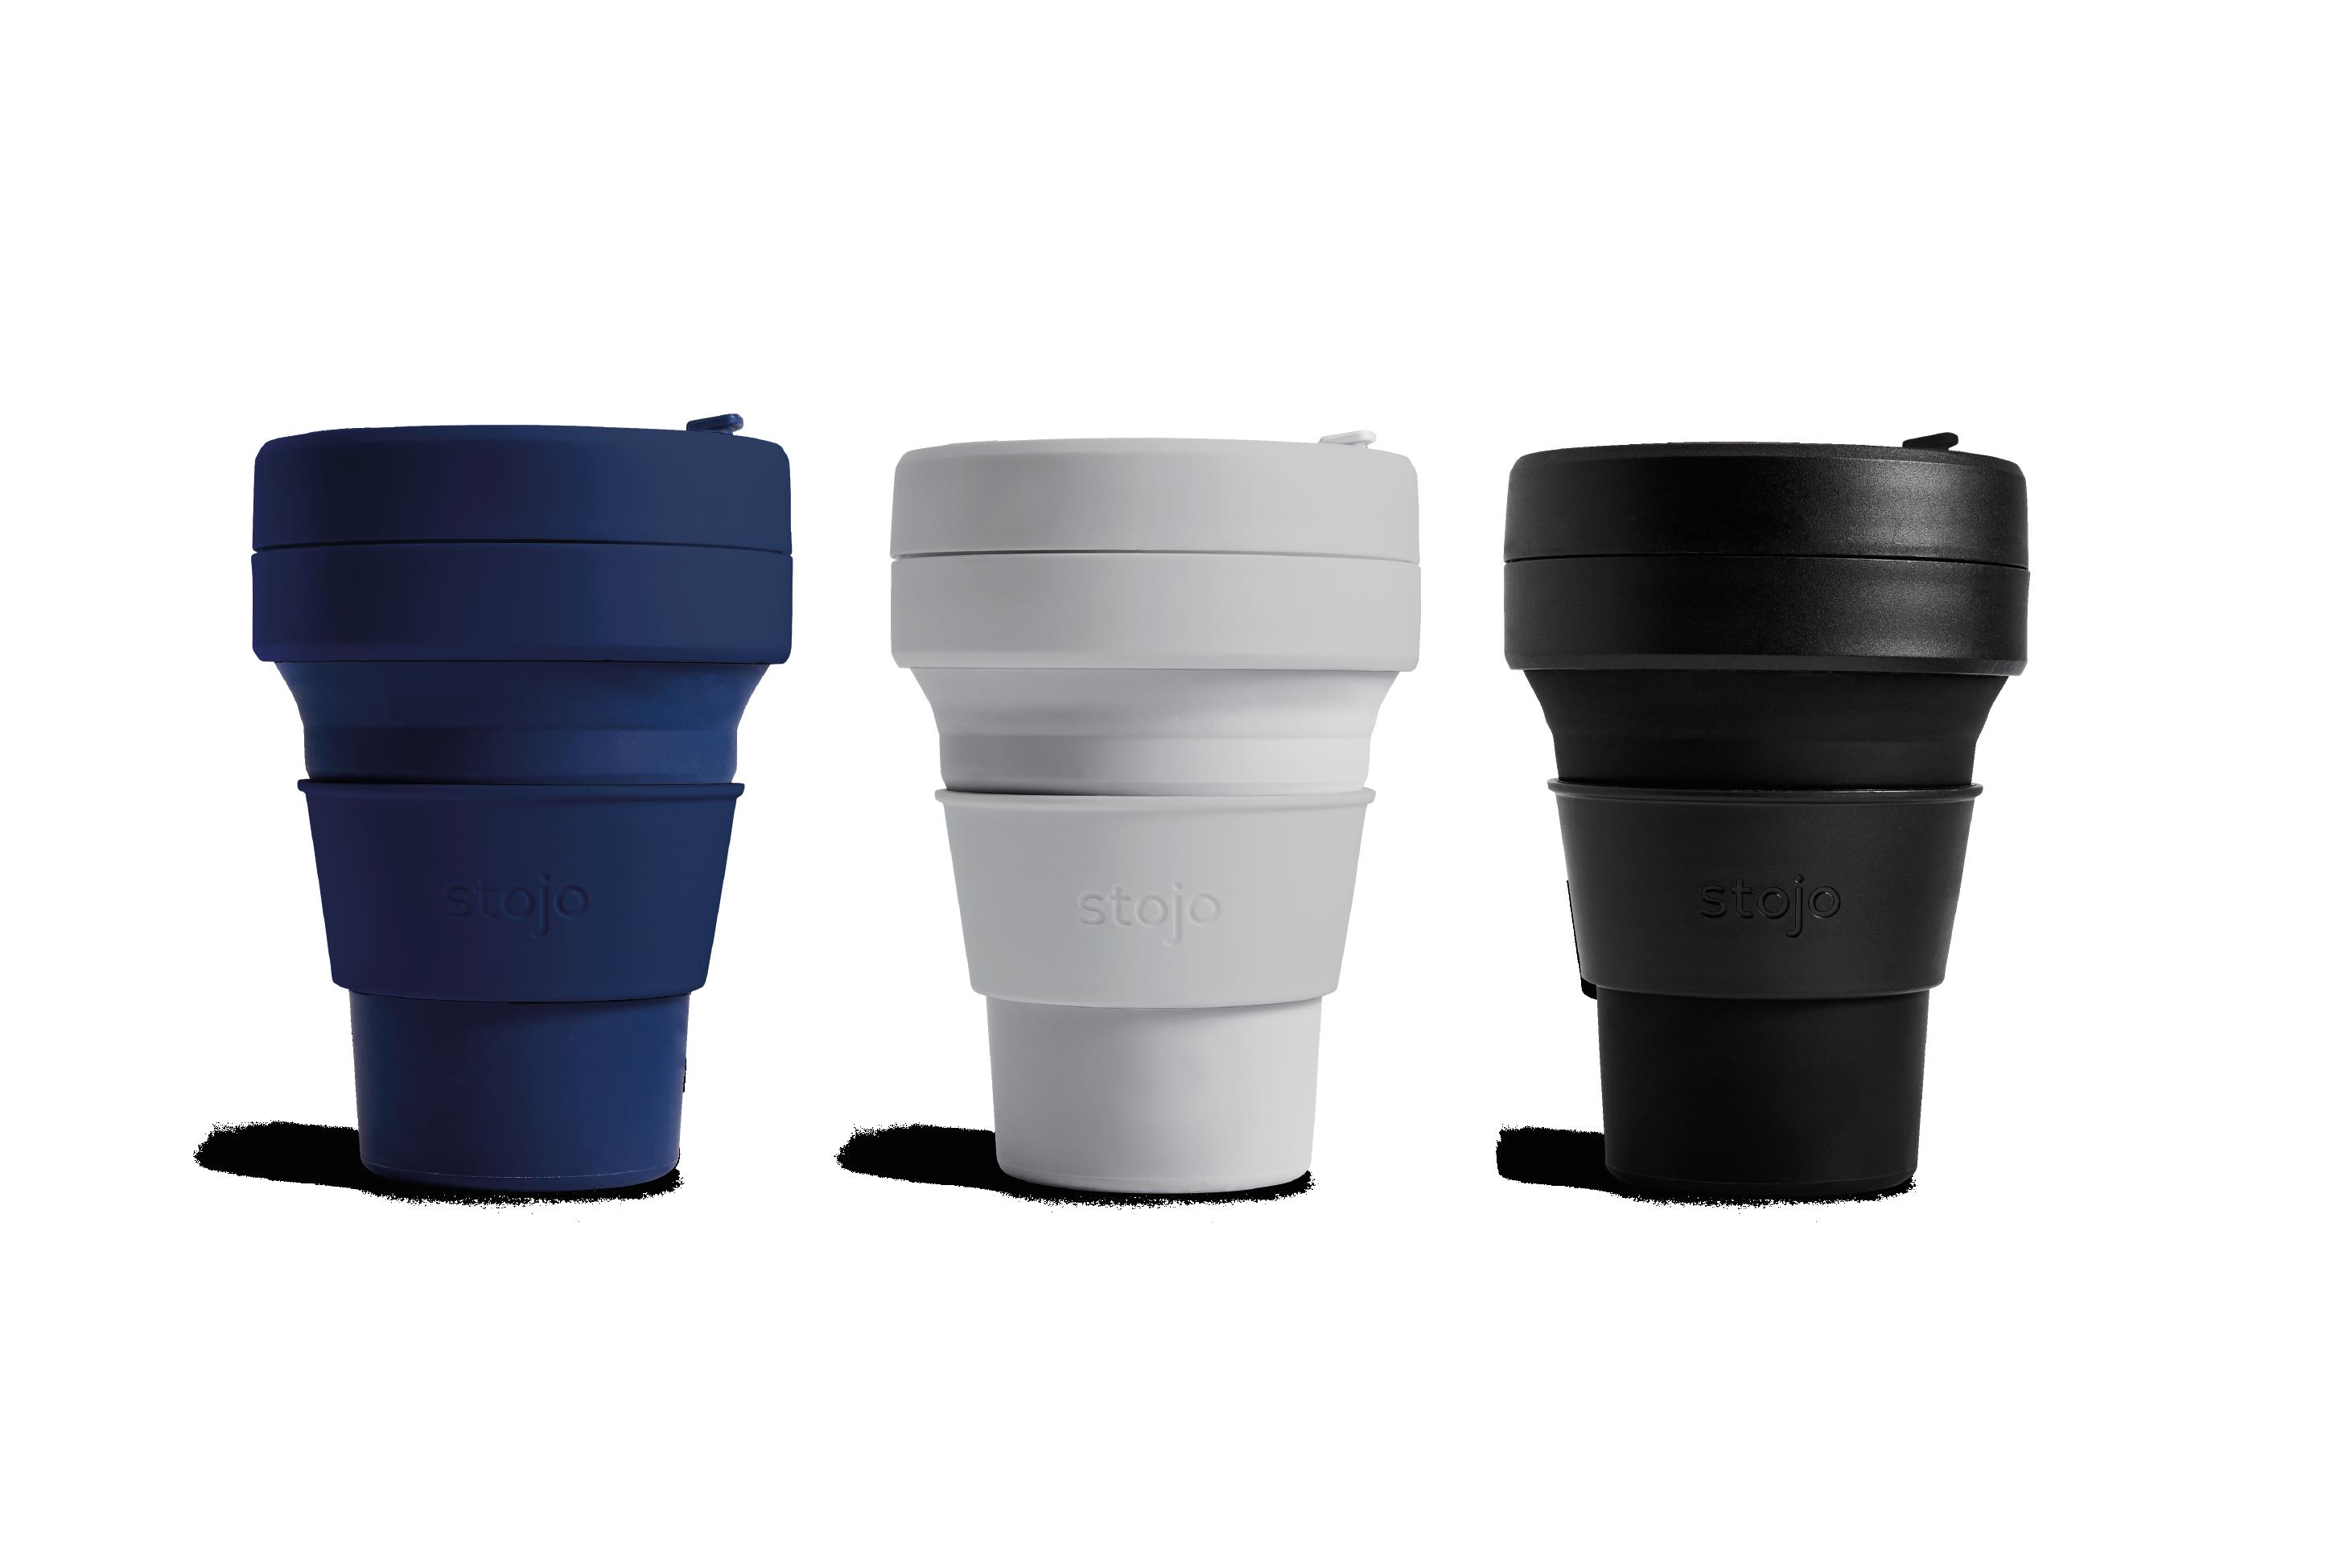 branded Stojo cup